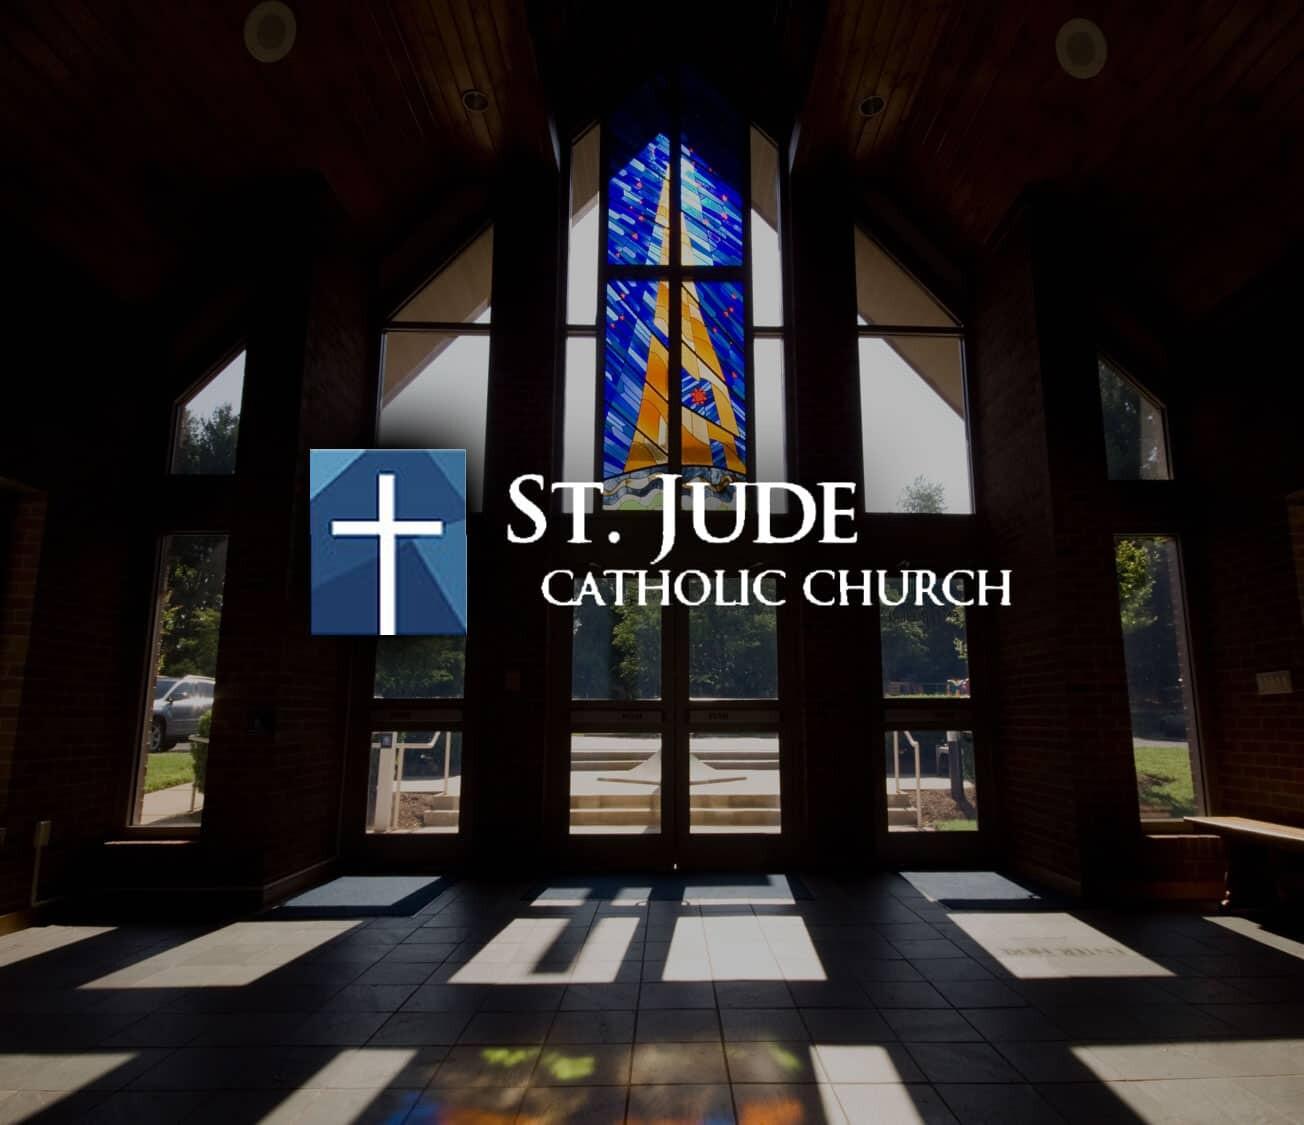 church web design syracuse central new york